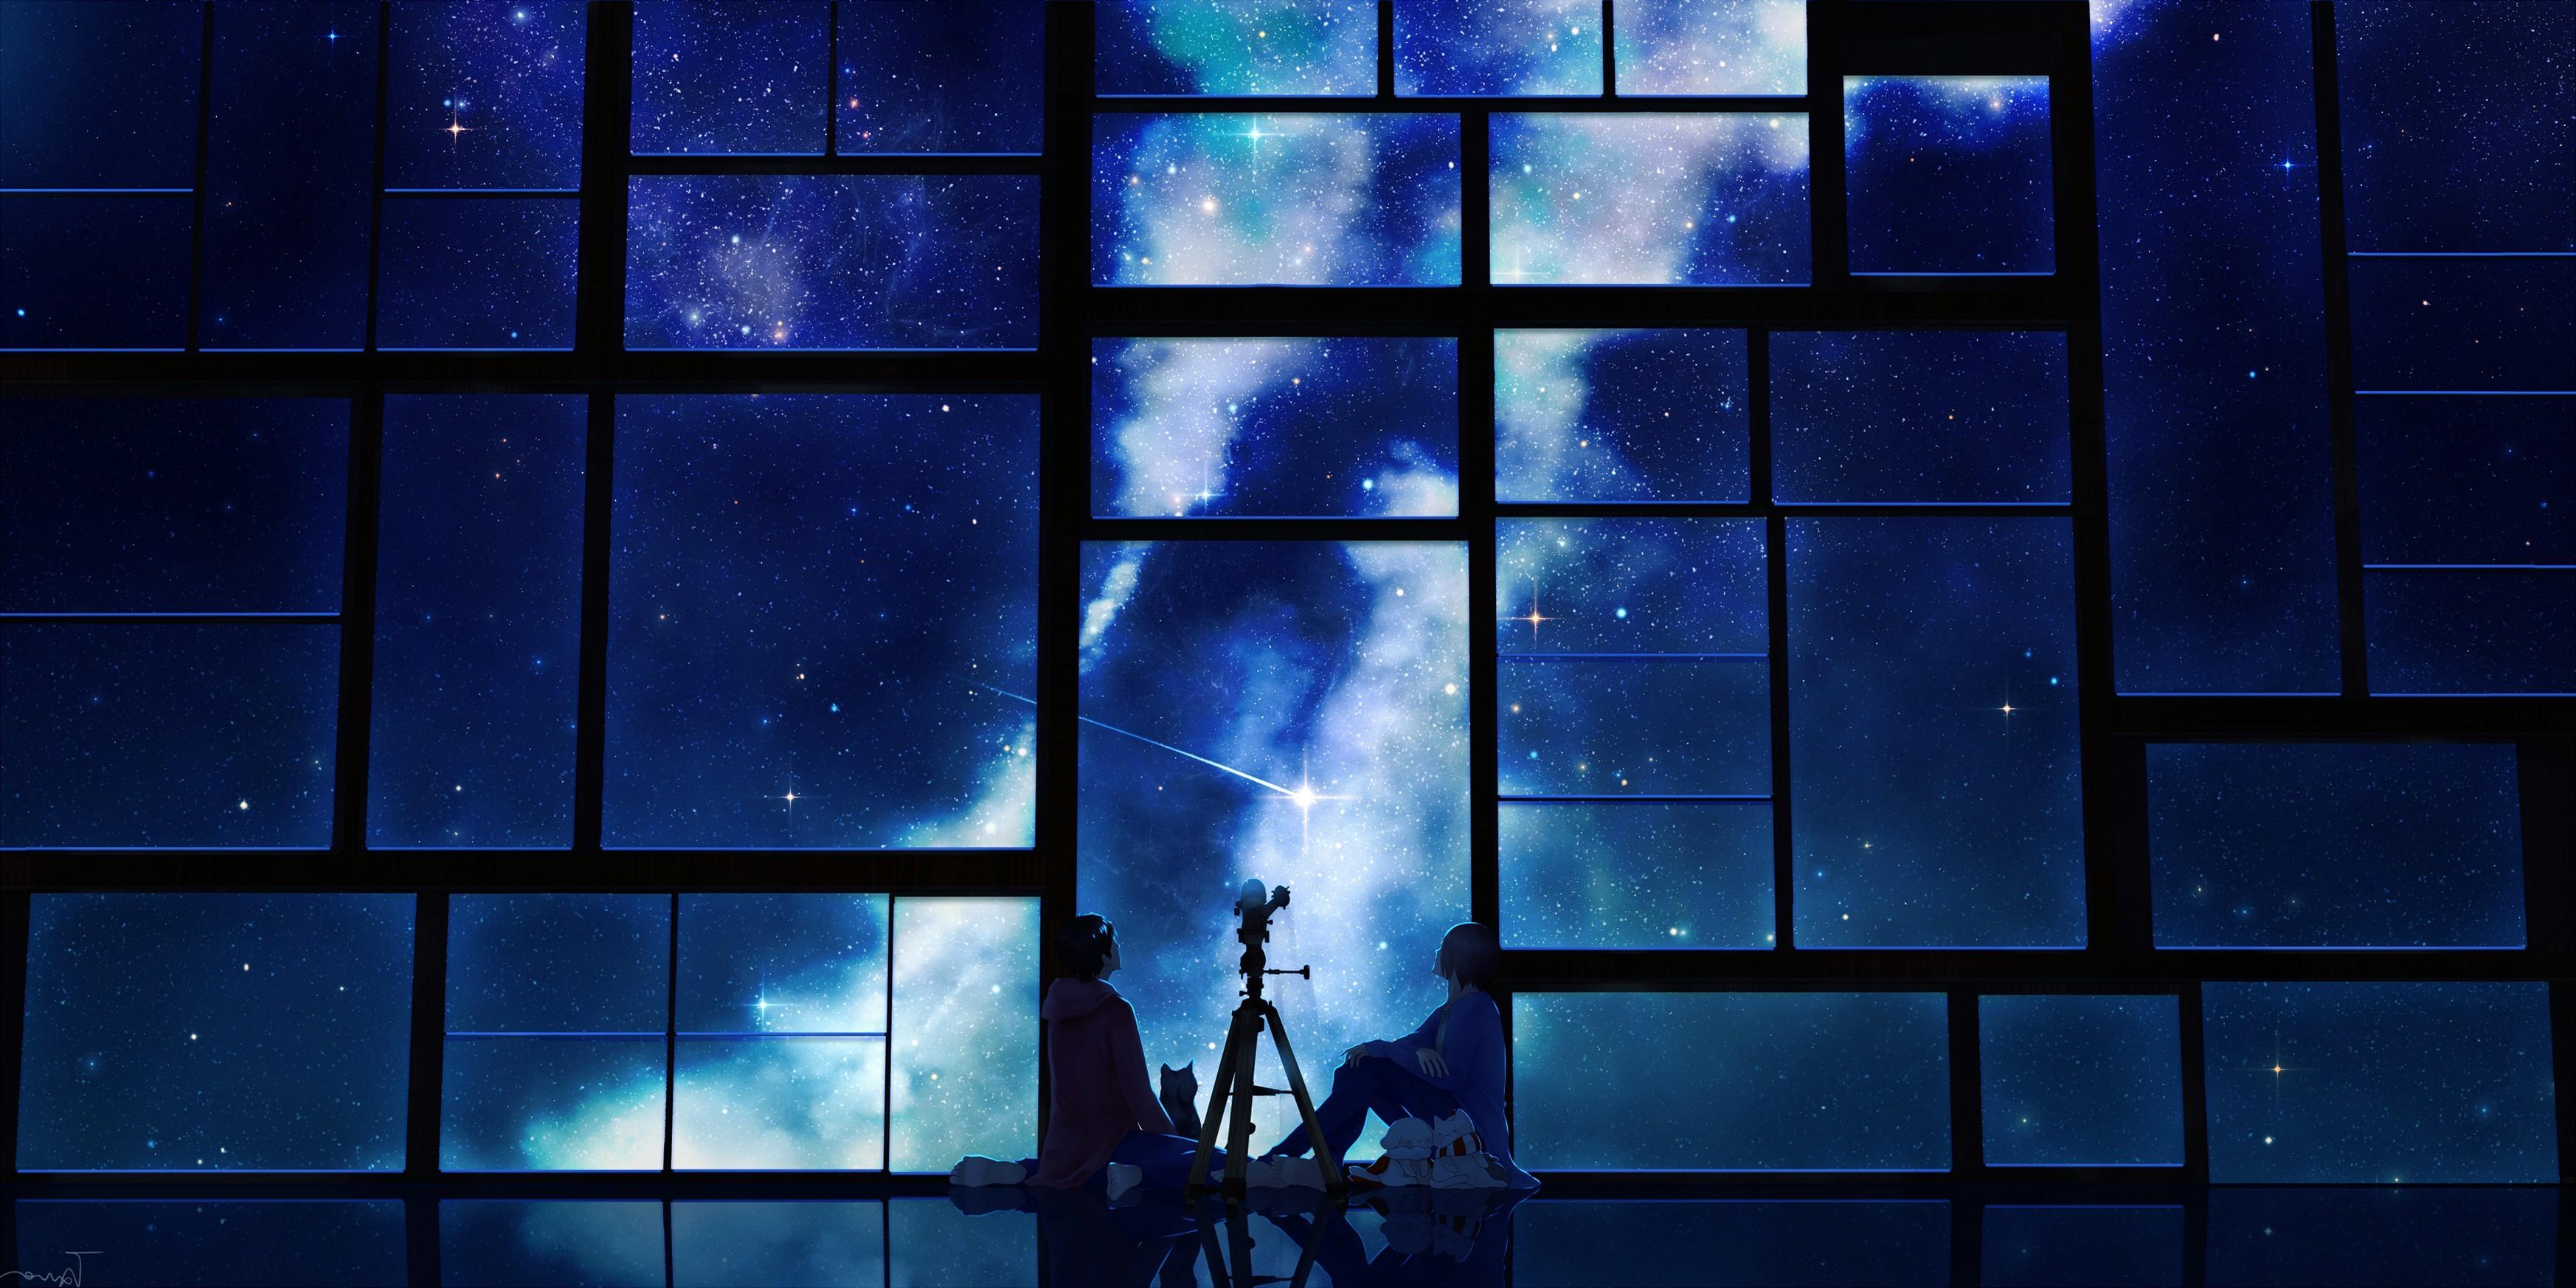 Tamagosho Sky Stars Telescope Night Window Popular Anime Phone Wallpaper